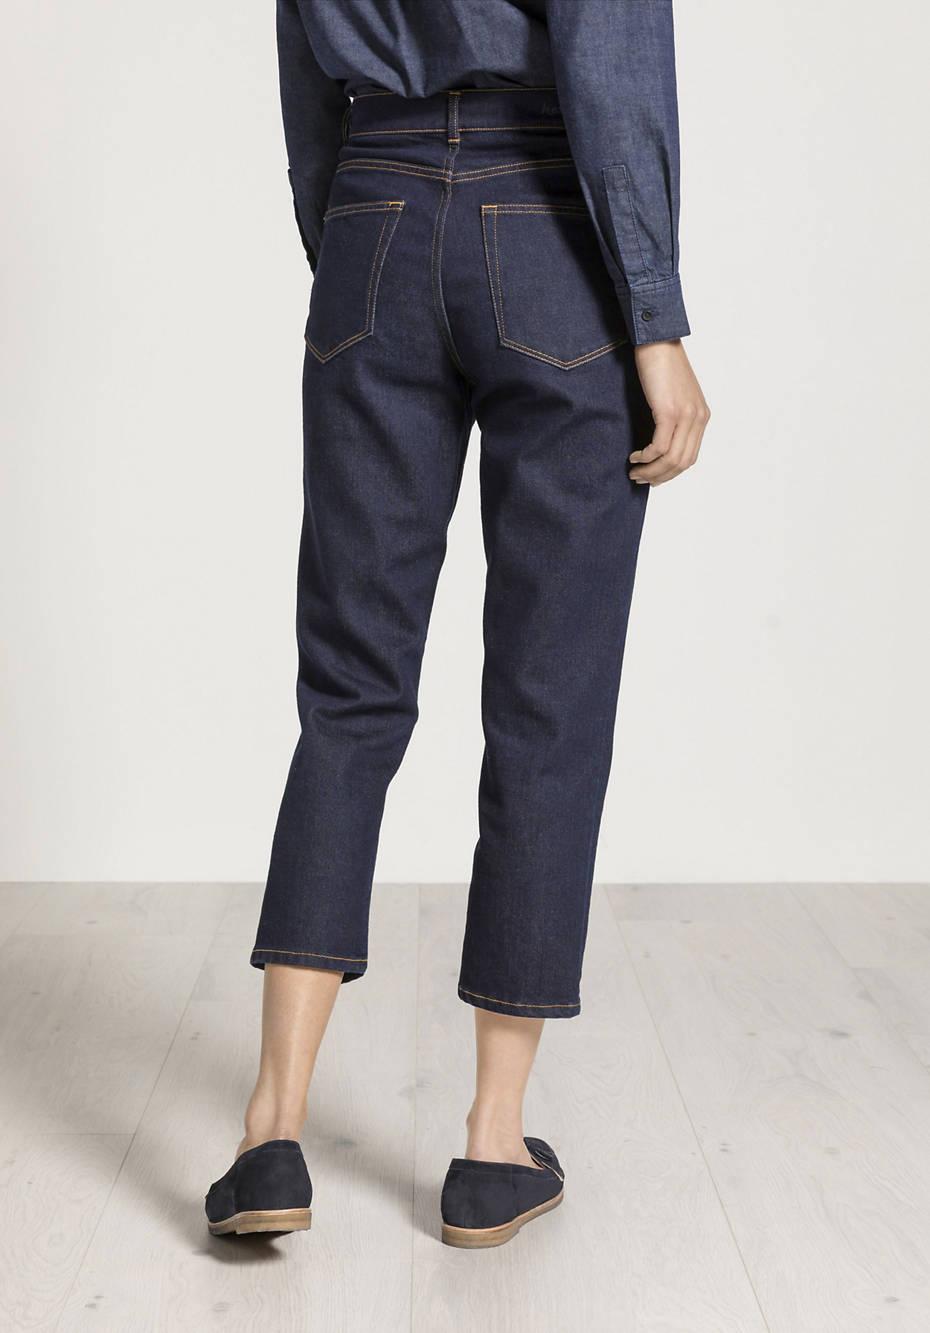 Wool denim jeans barrel leg made of organic cotton with virgin wool